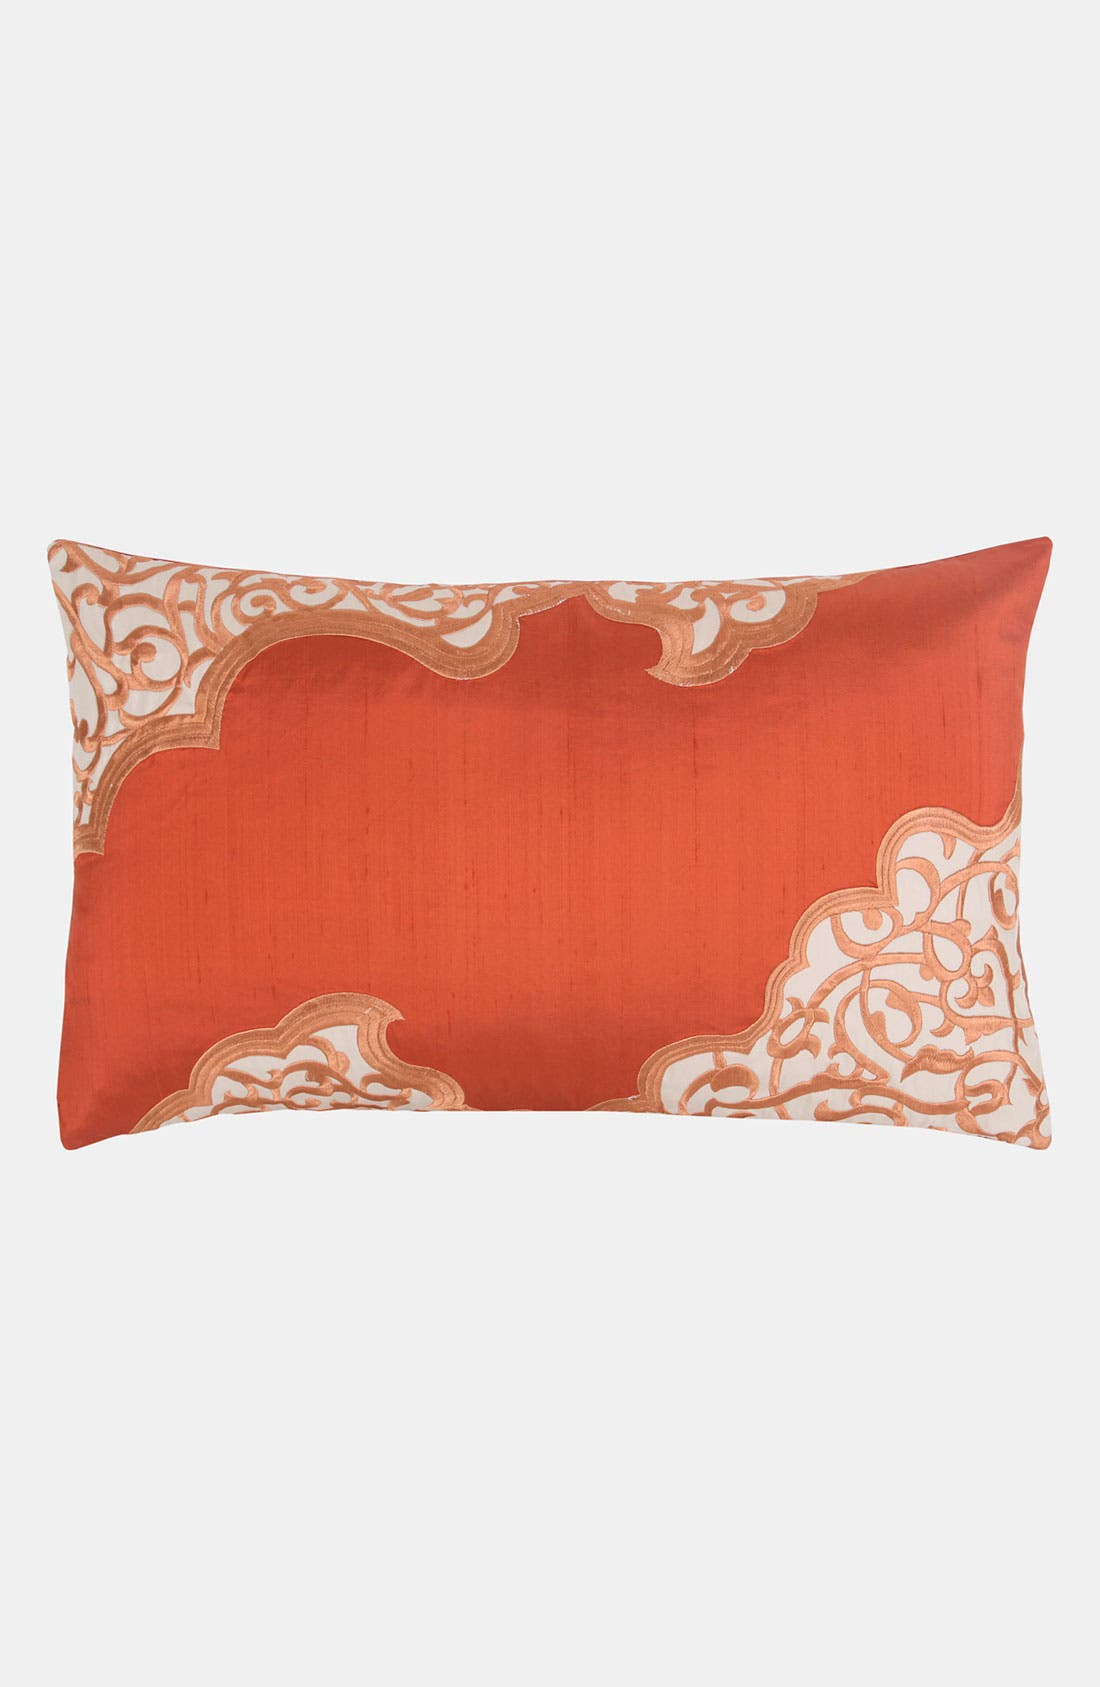 Alternate Image 1 Selected - Blissliving Home 'Zahara' Pillow (Online Only)